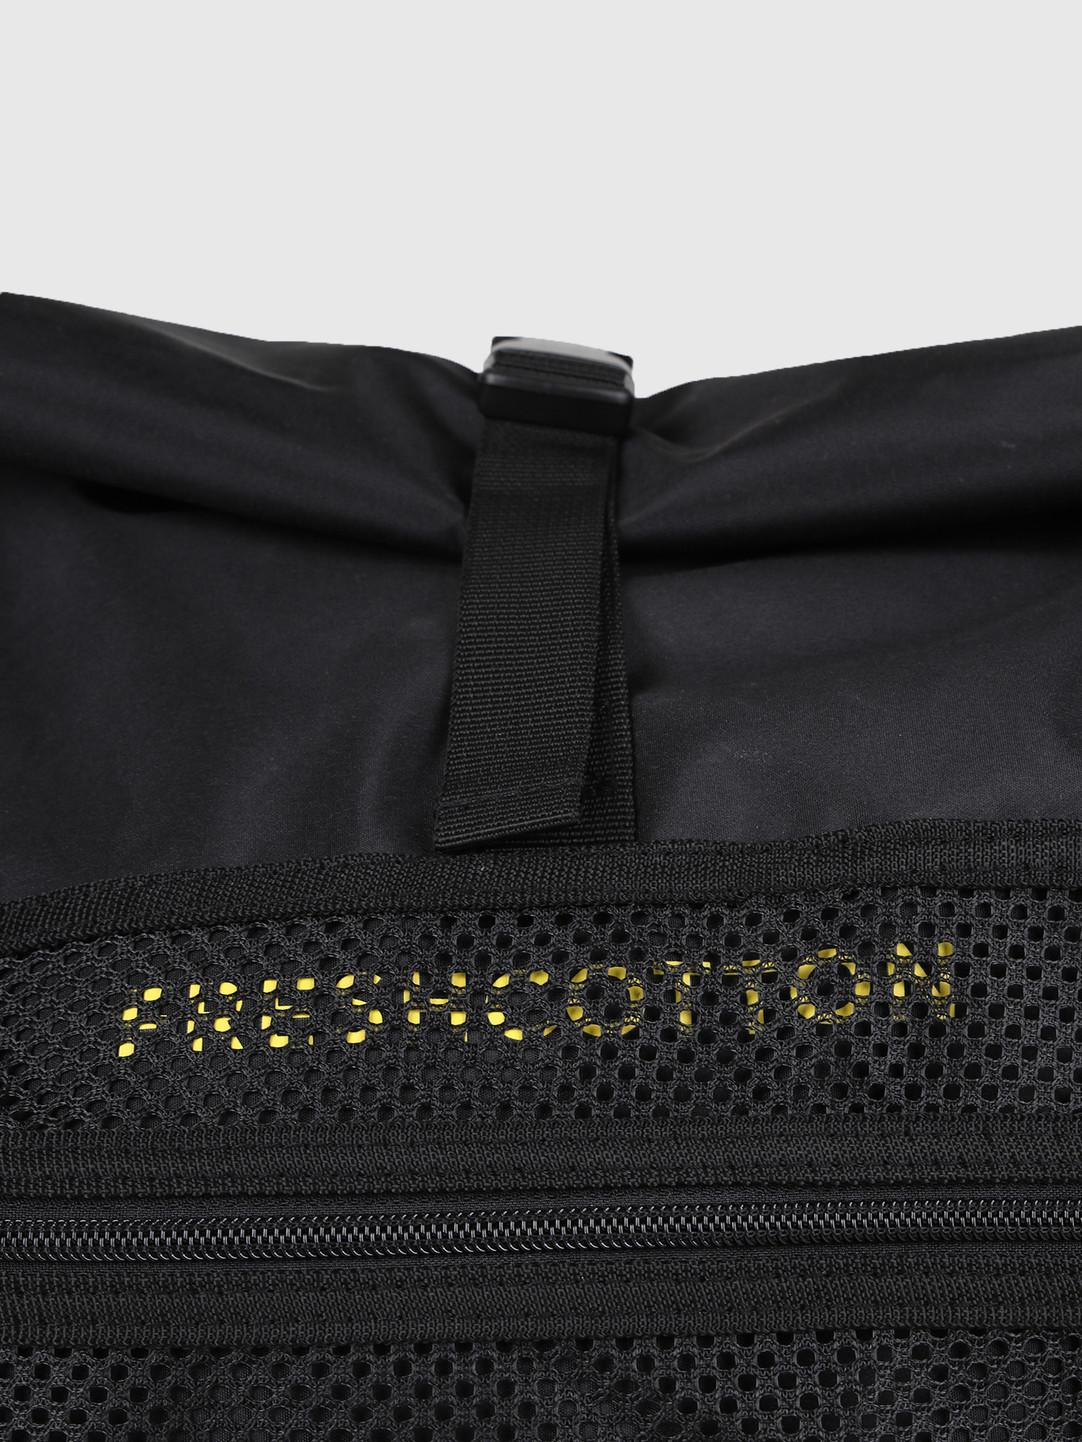 FRESHCOTTON x ADE FRESHCOTTON x ADE Backpack Black